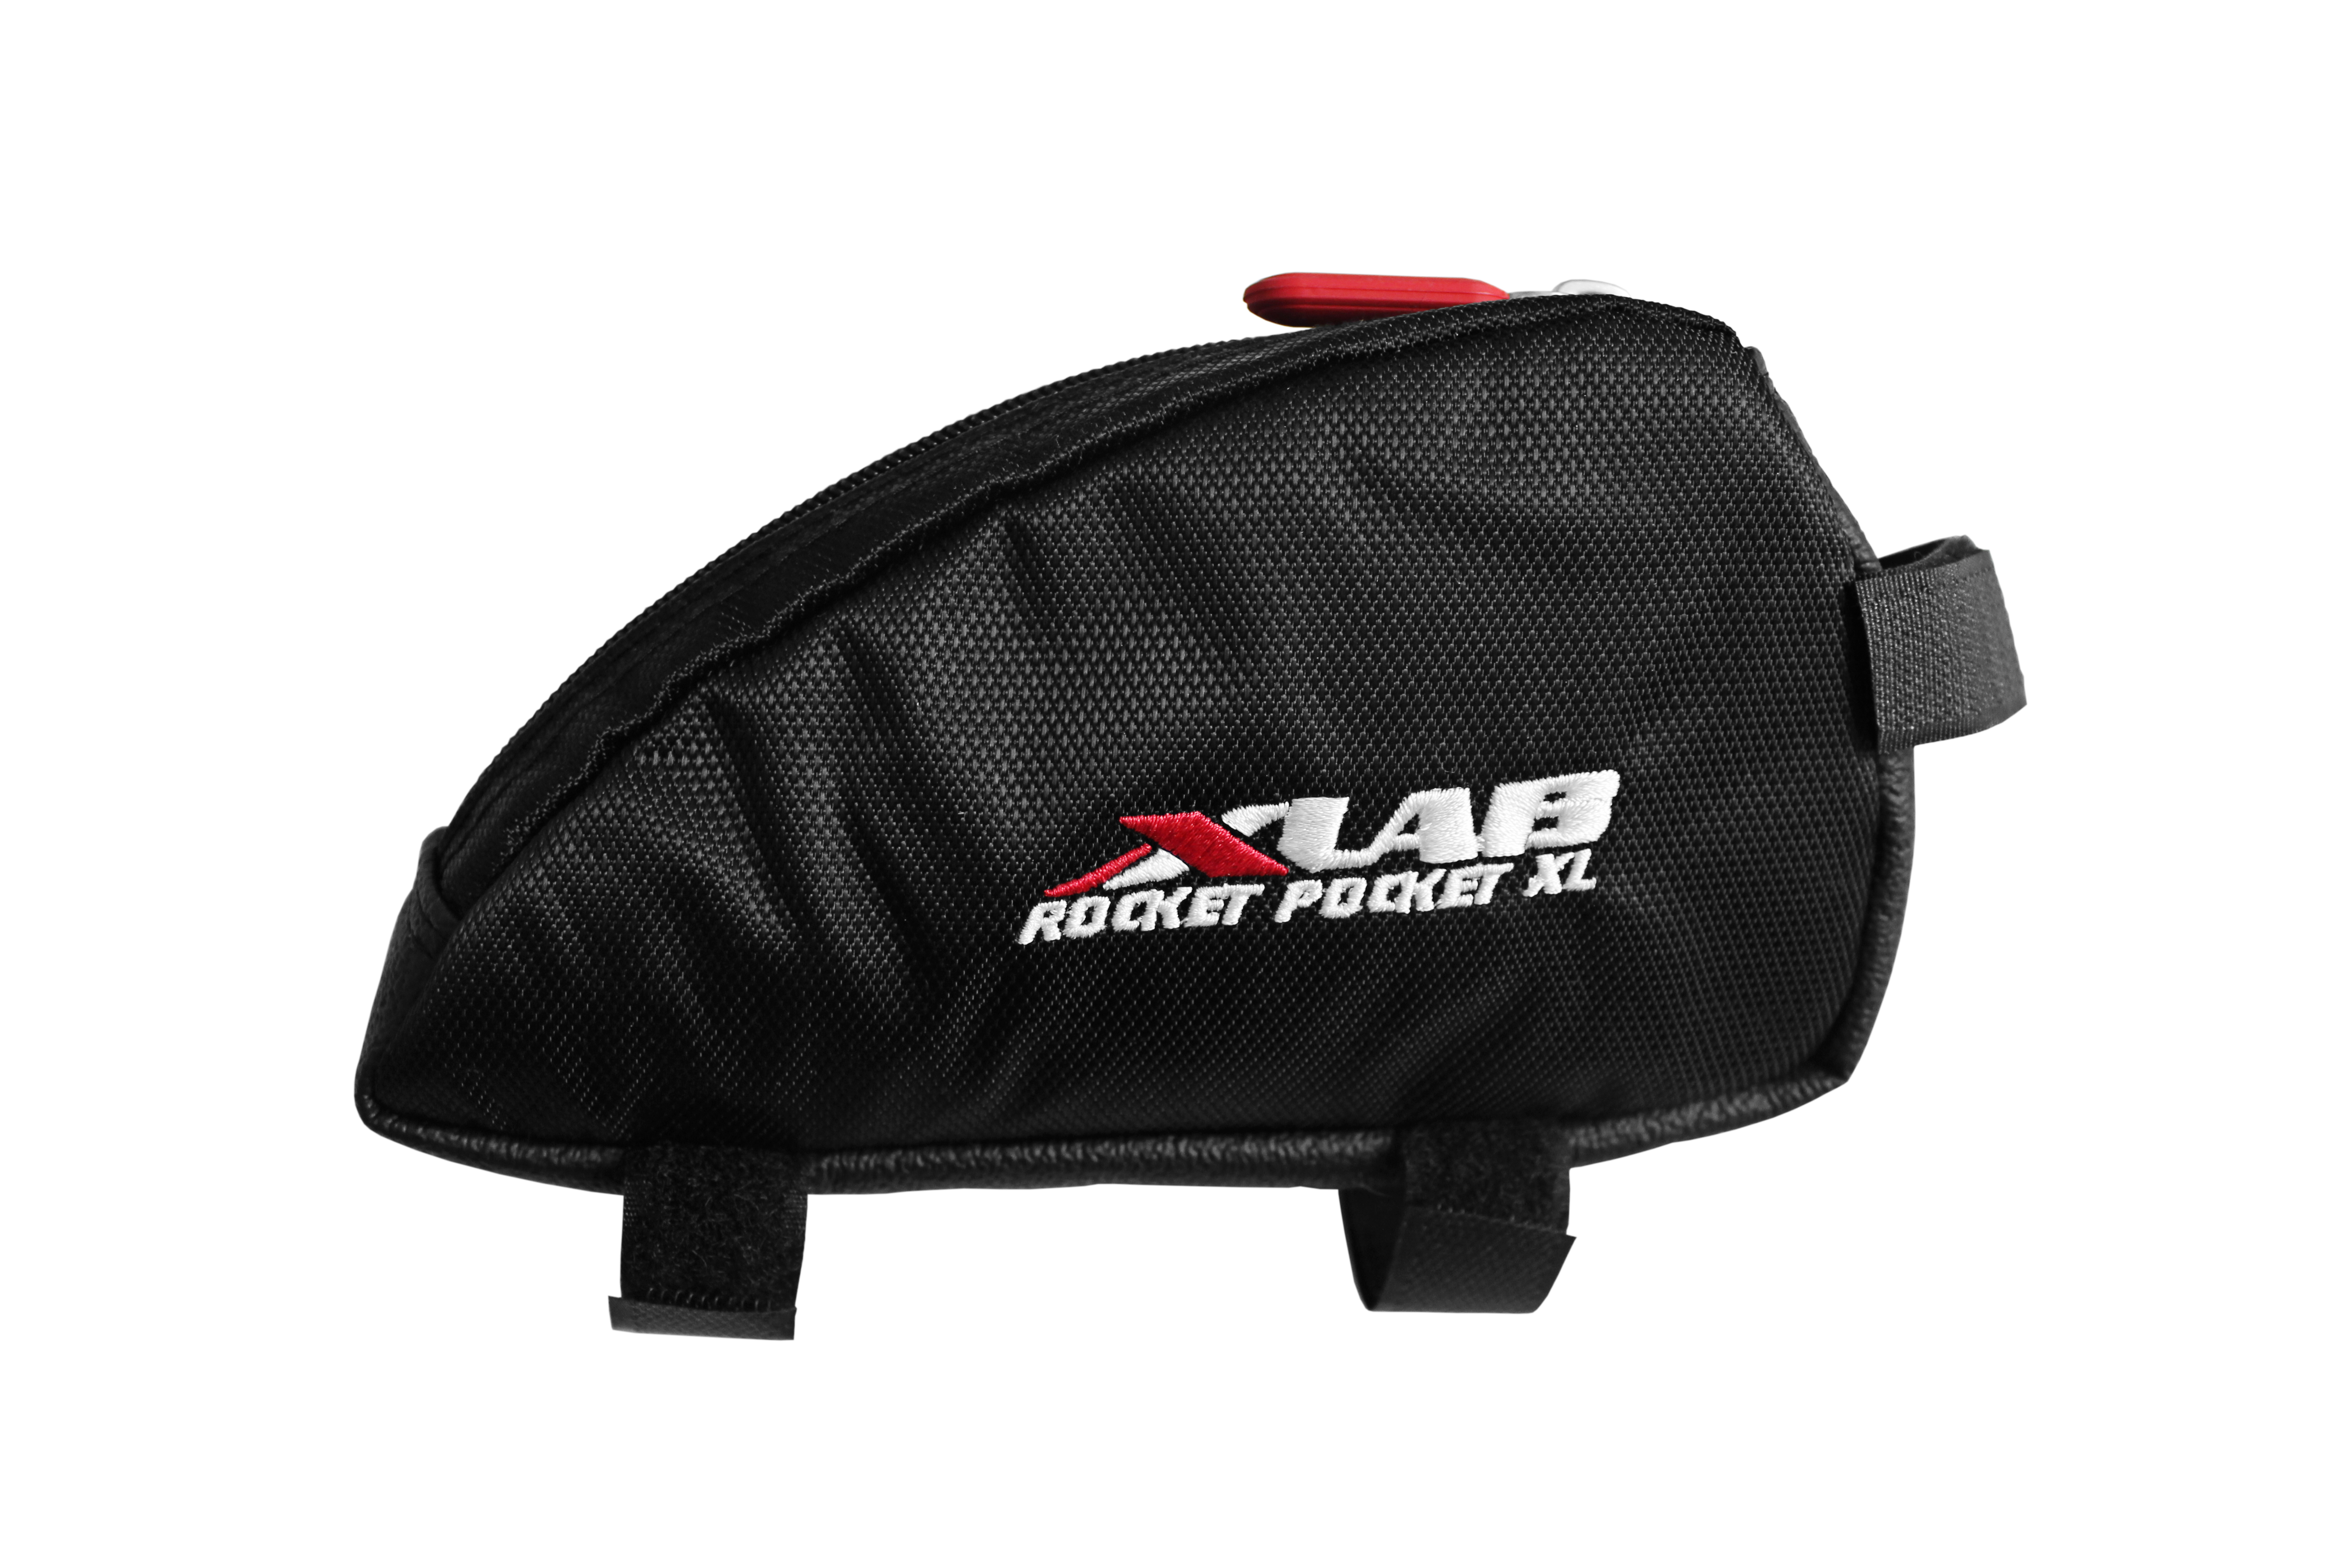 Storage Top Tube // Stem Bag XLAB Rocket Pocket Triathlon